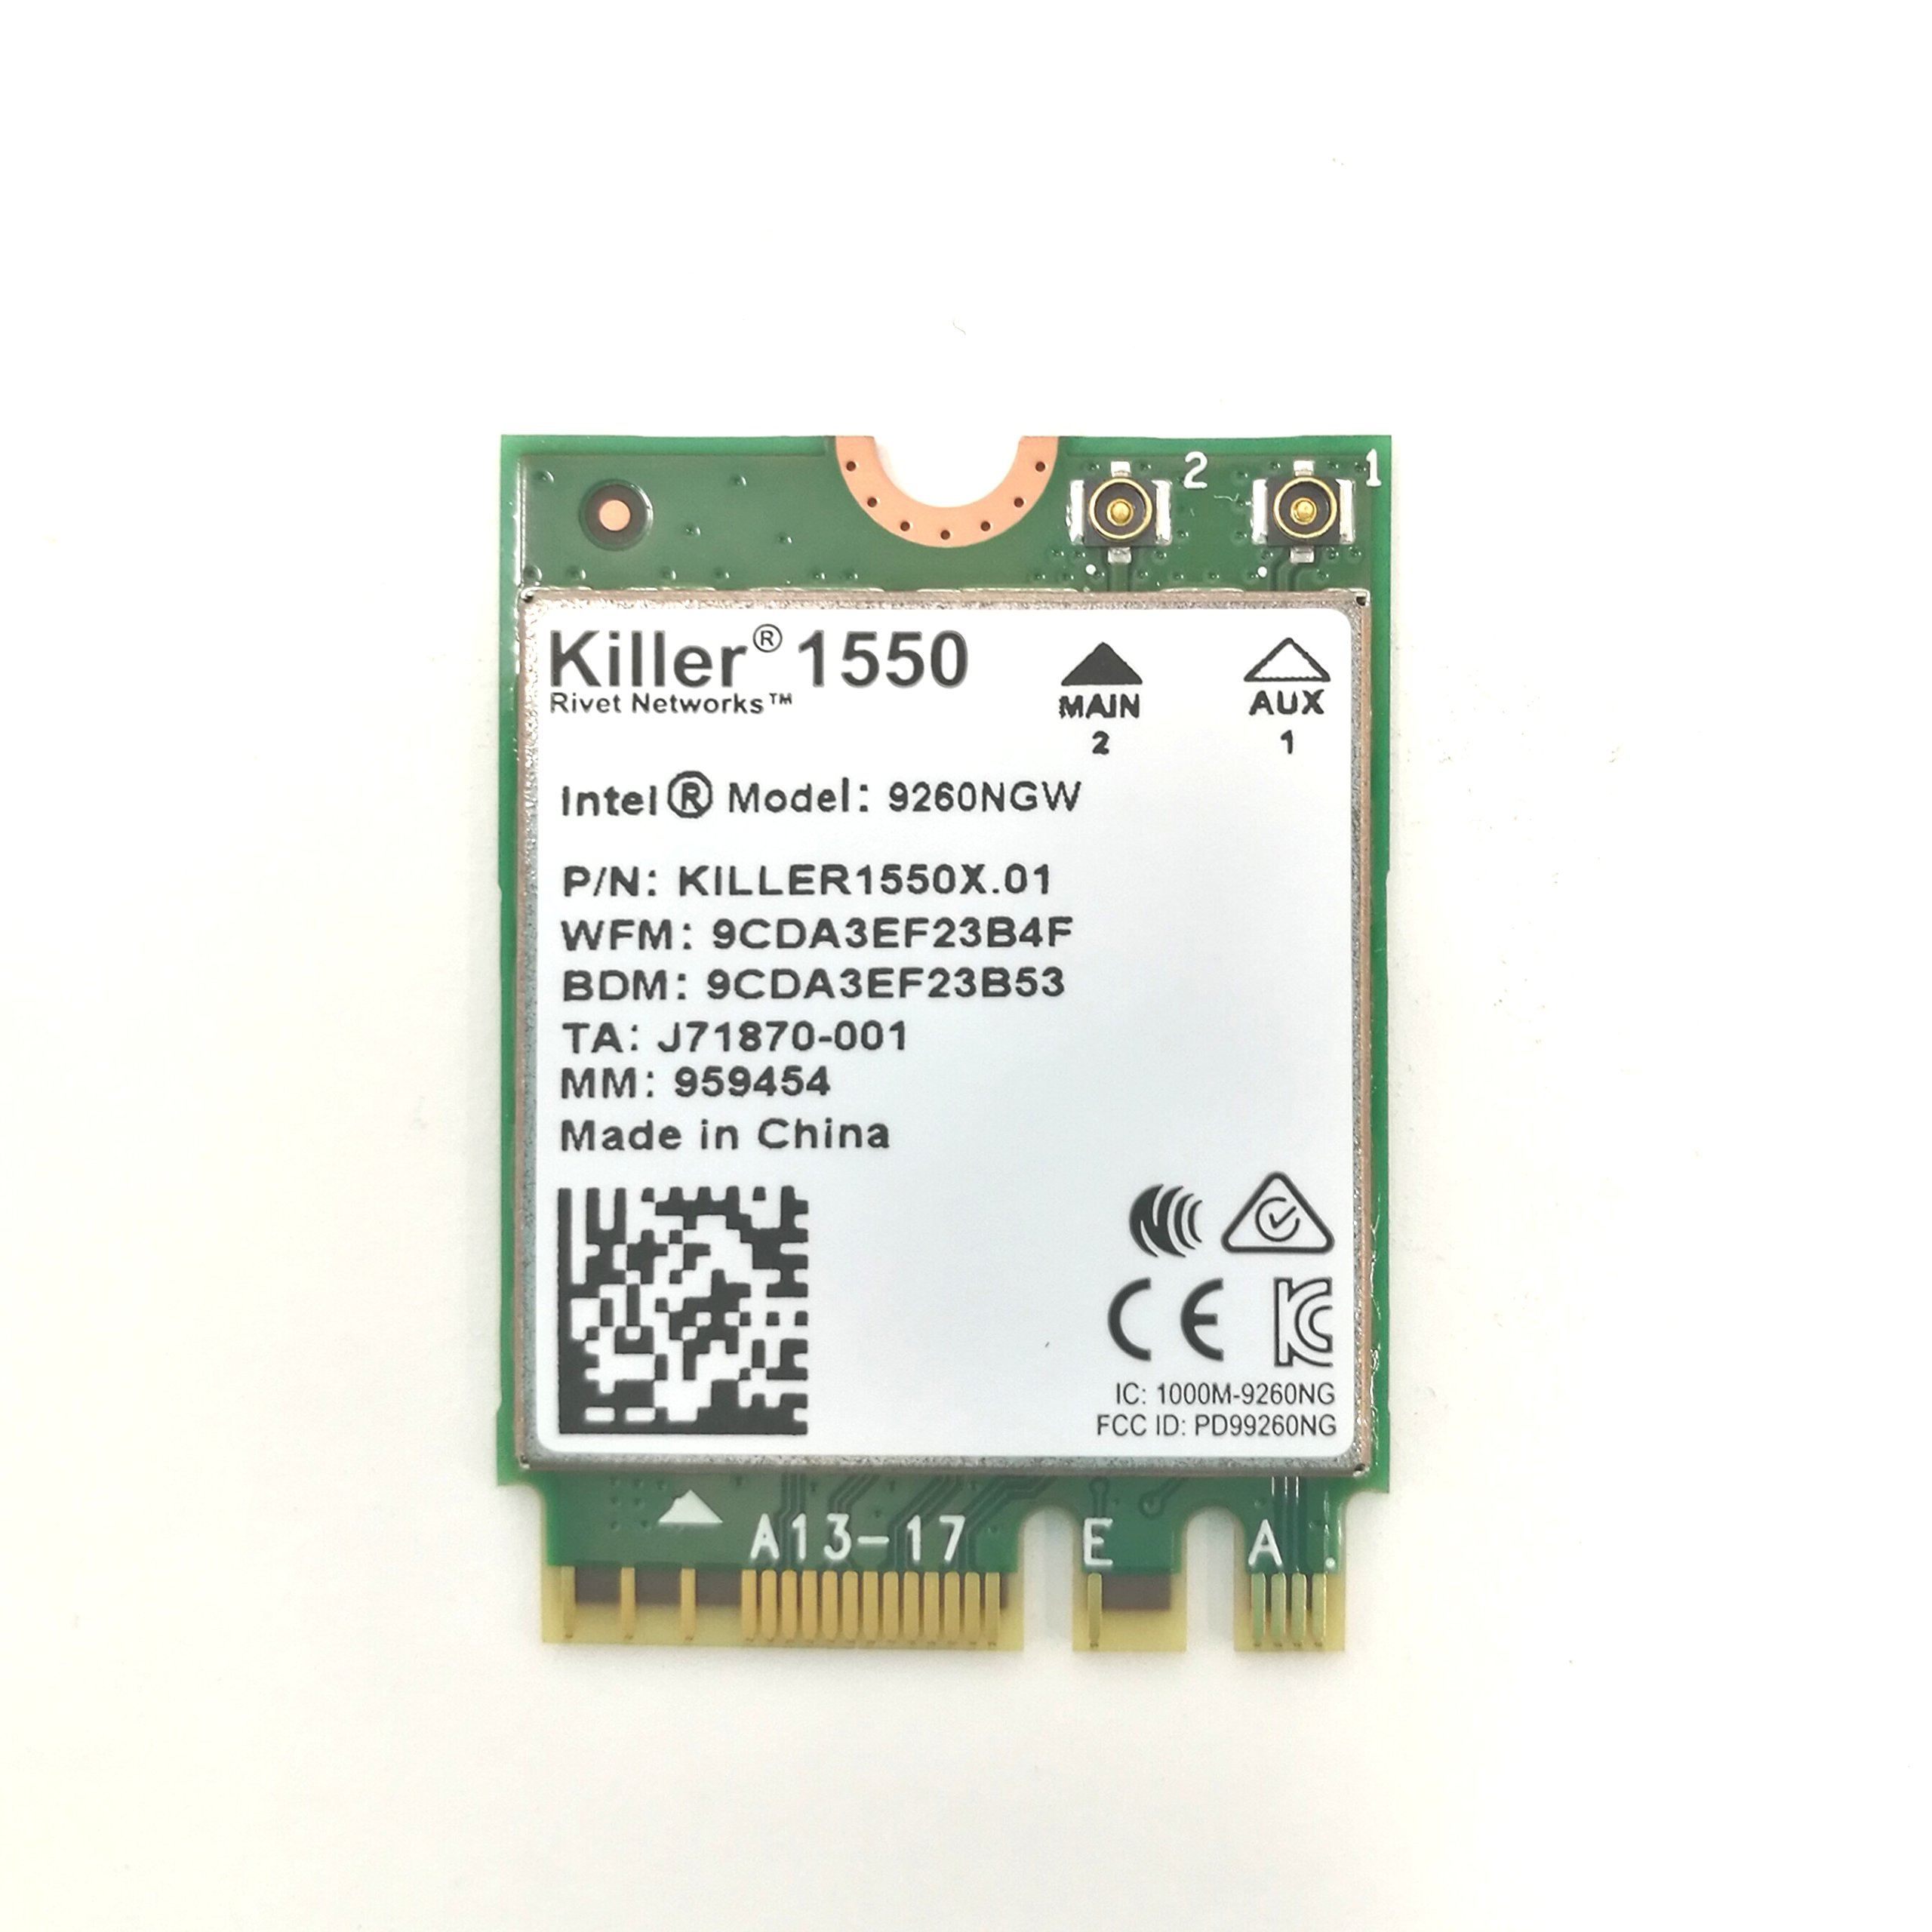 HIDevolution Killer Wireless-AC 1550 802.11ac 2x2 Wireless Card w/Bluetooth 5.0, Replacement for Killer 1535 by HIDevolution